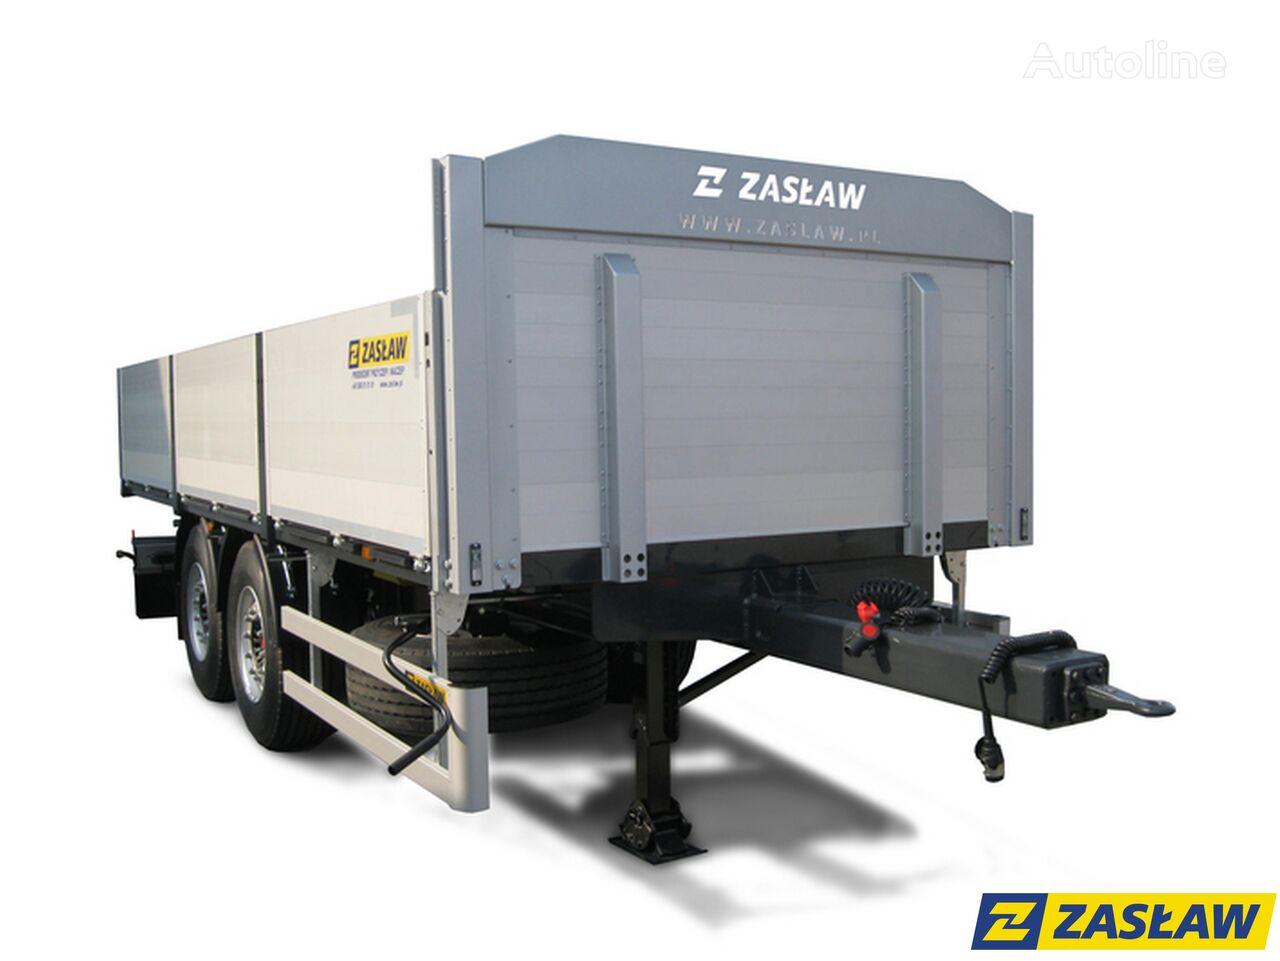 new ZASLAW TRAILIS 670.PC.65.06.BESIP flatbed trailer